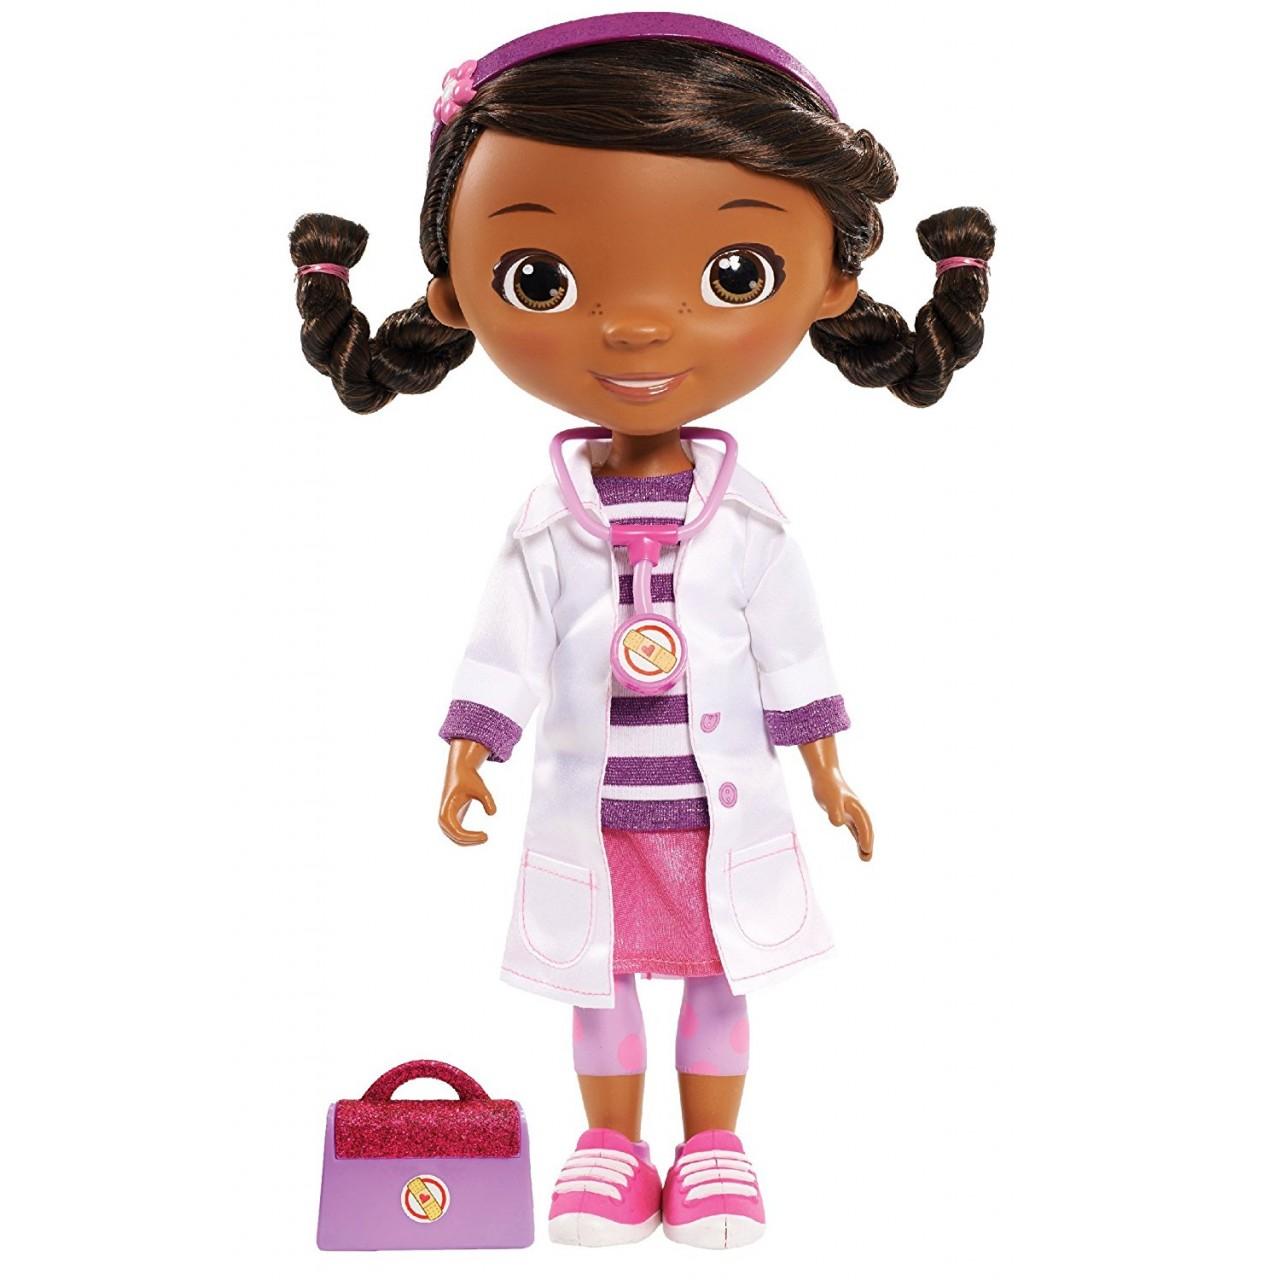 Кукла Доктор Плюшева в розовом